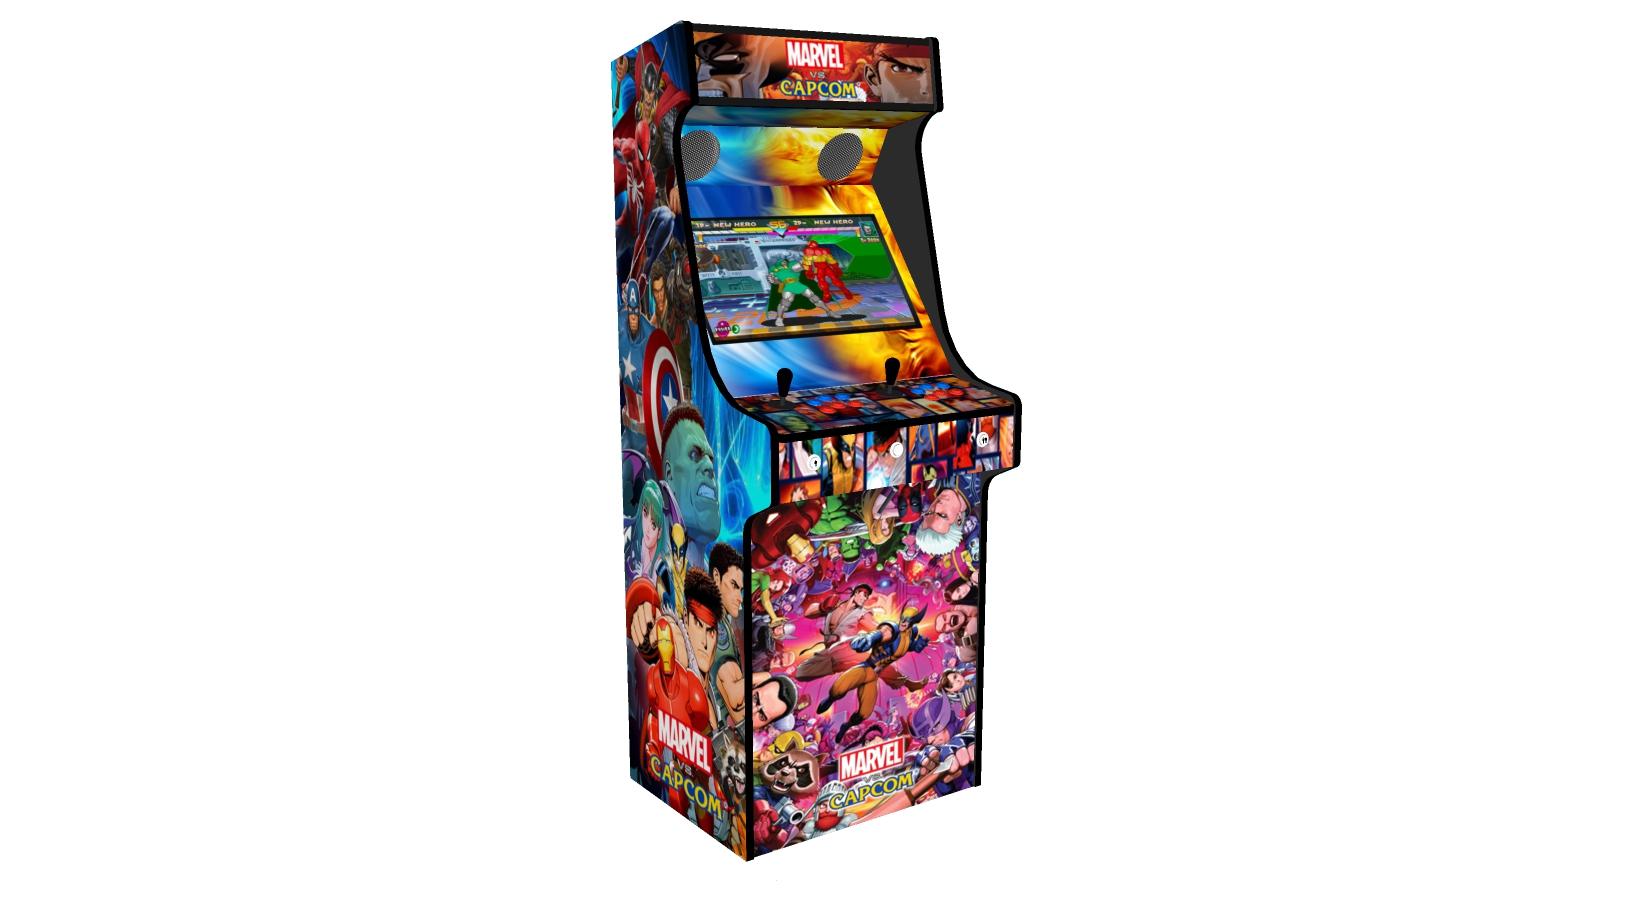 Classic Upright Arcade Machine - Marvel vs Capcom Theme - Left